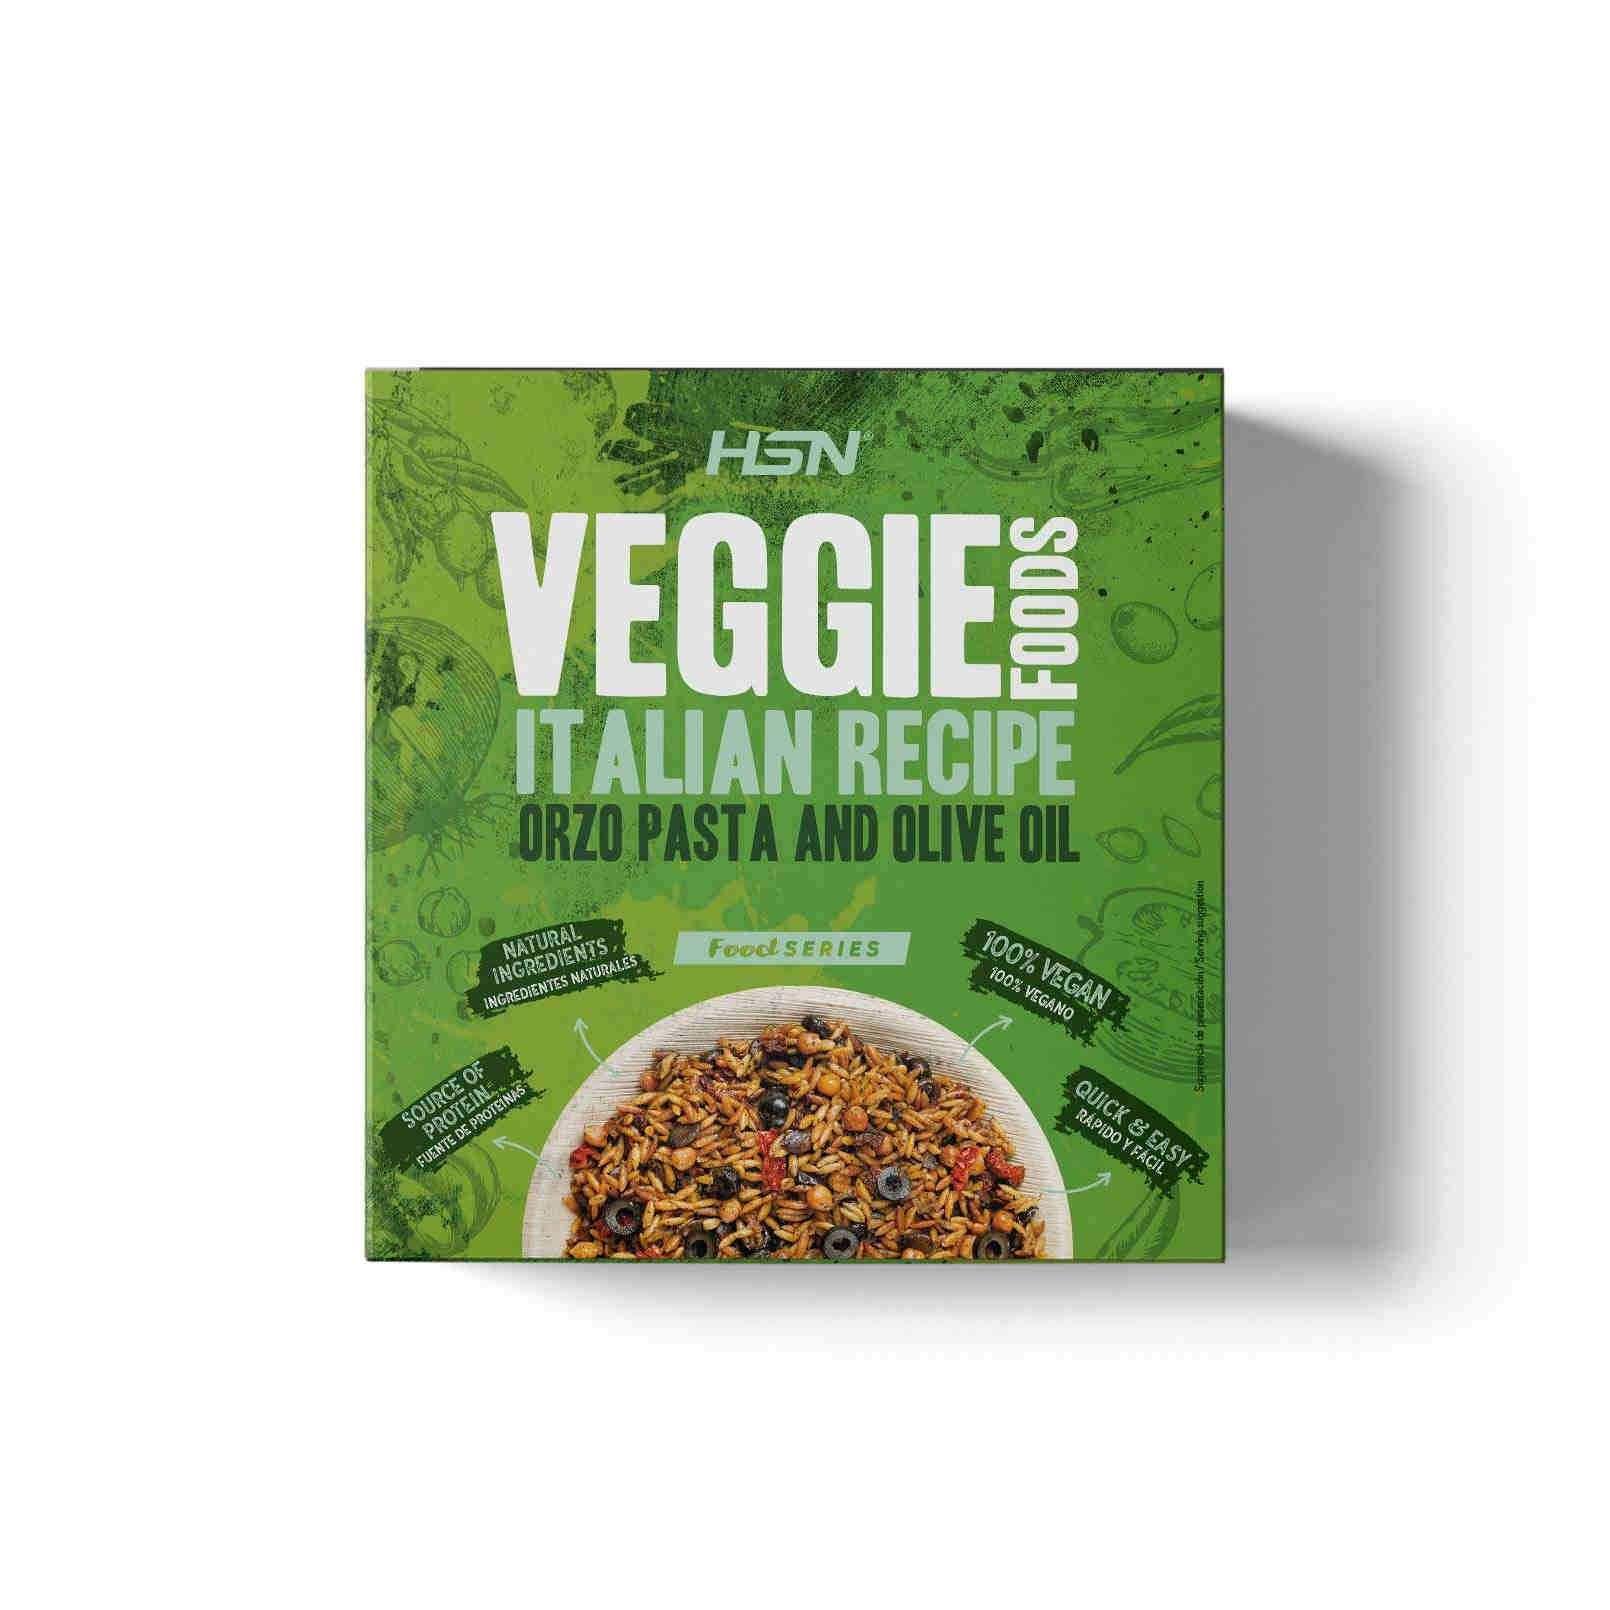 VEGGIE FOODS PASTA ORZO CON OLIO D'OLIVA STILE ITALIANO - 280g